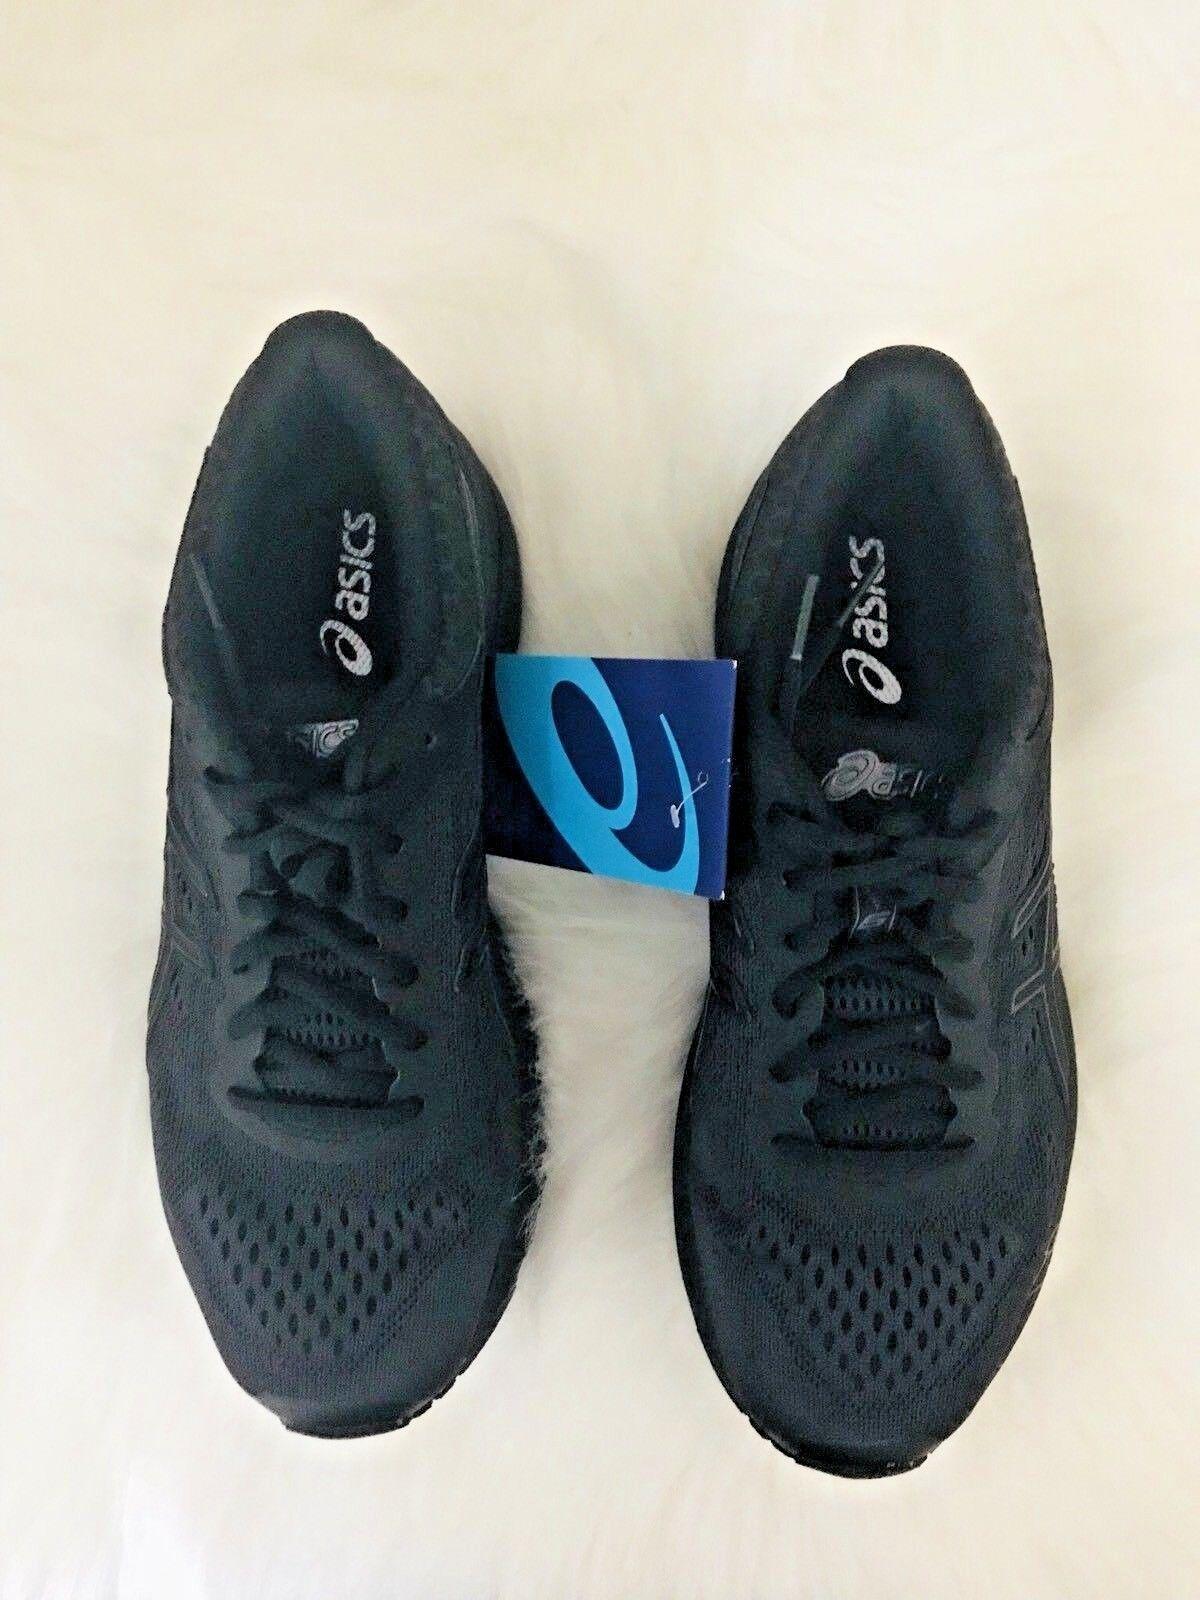 ASICS GT- 1000 6 WOMEN'S RUNNING SHOES BLACK SNEAKERS SZ 9 T7A9N-9090